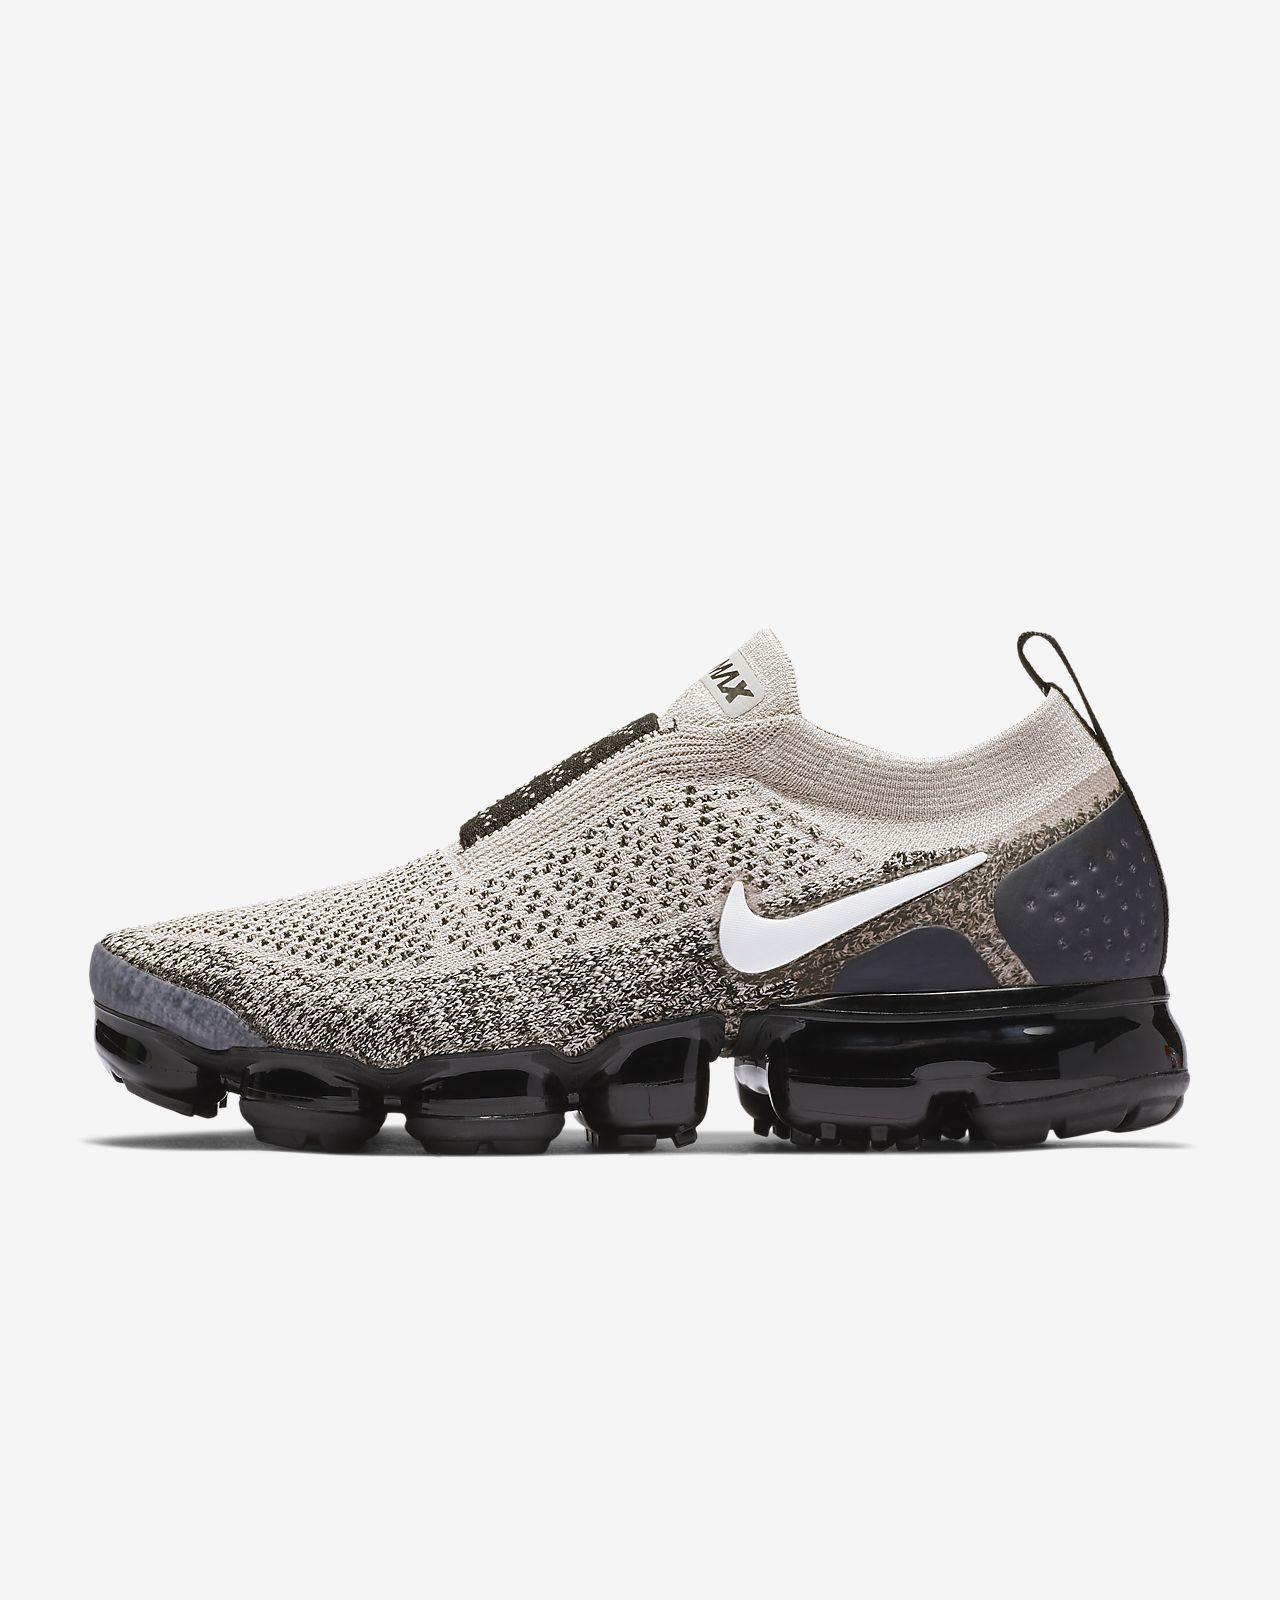 the latest 02126 da5a3 ... Nike Air VaporMax Flyknit Moc 2-sko til kvinder